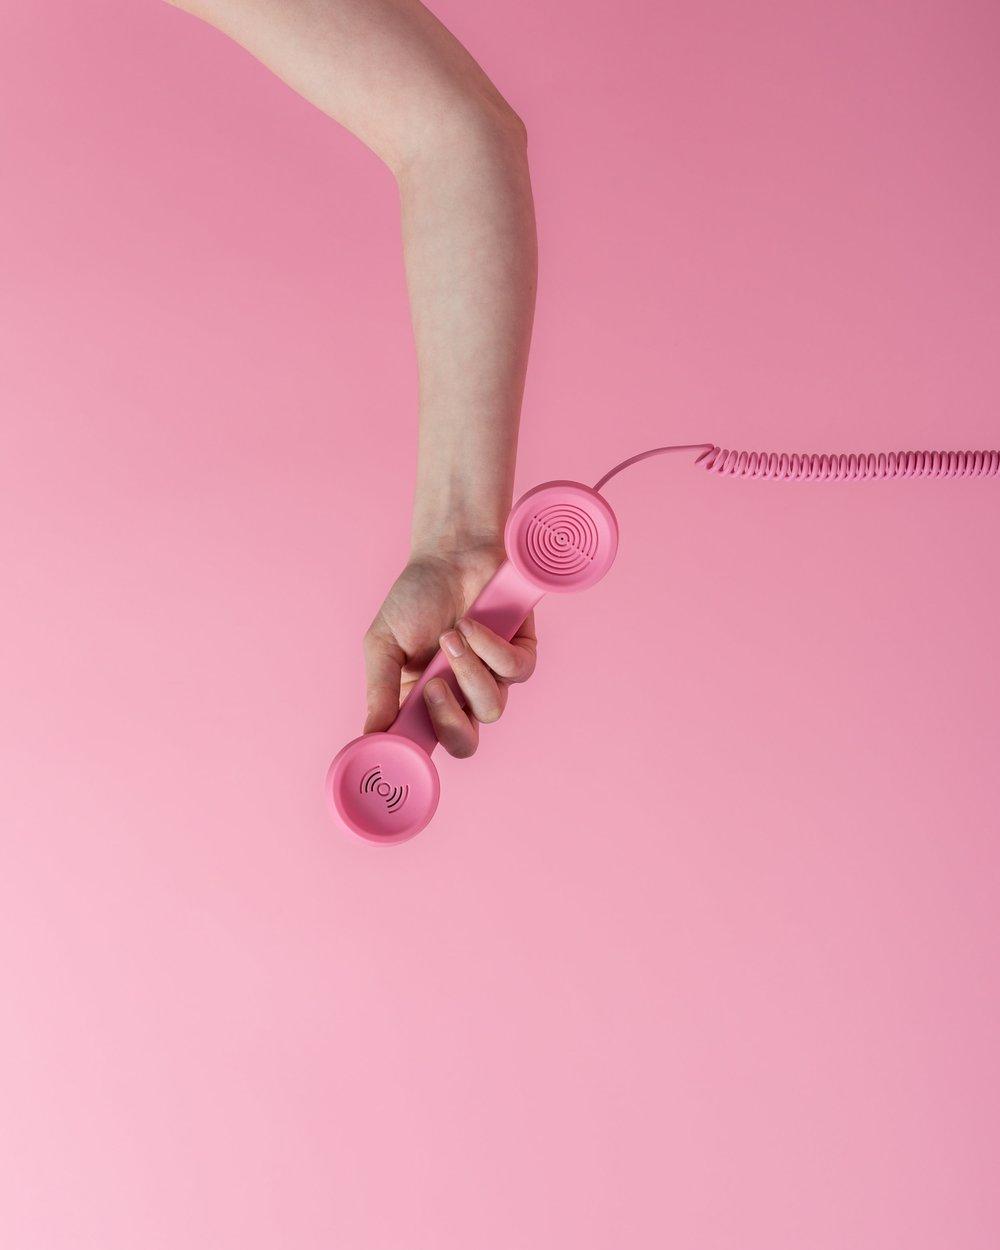 Monochrome Pink No. 4